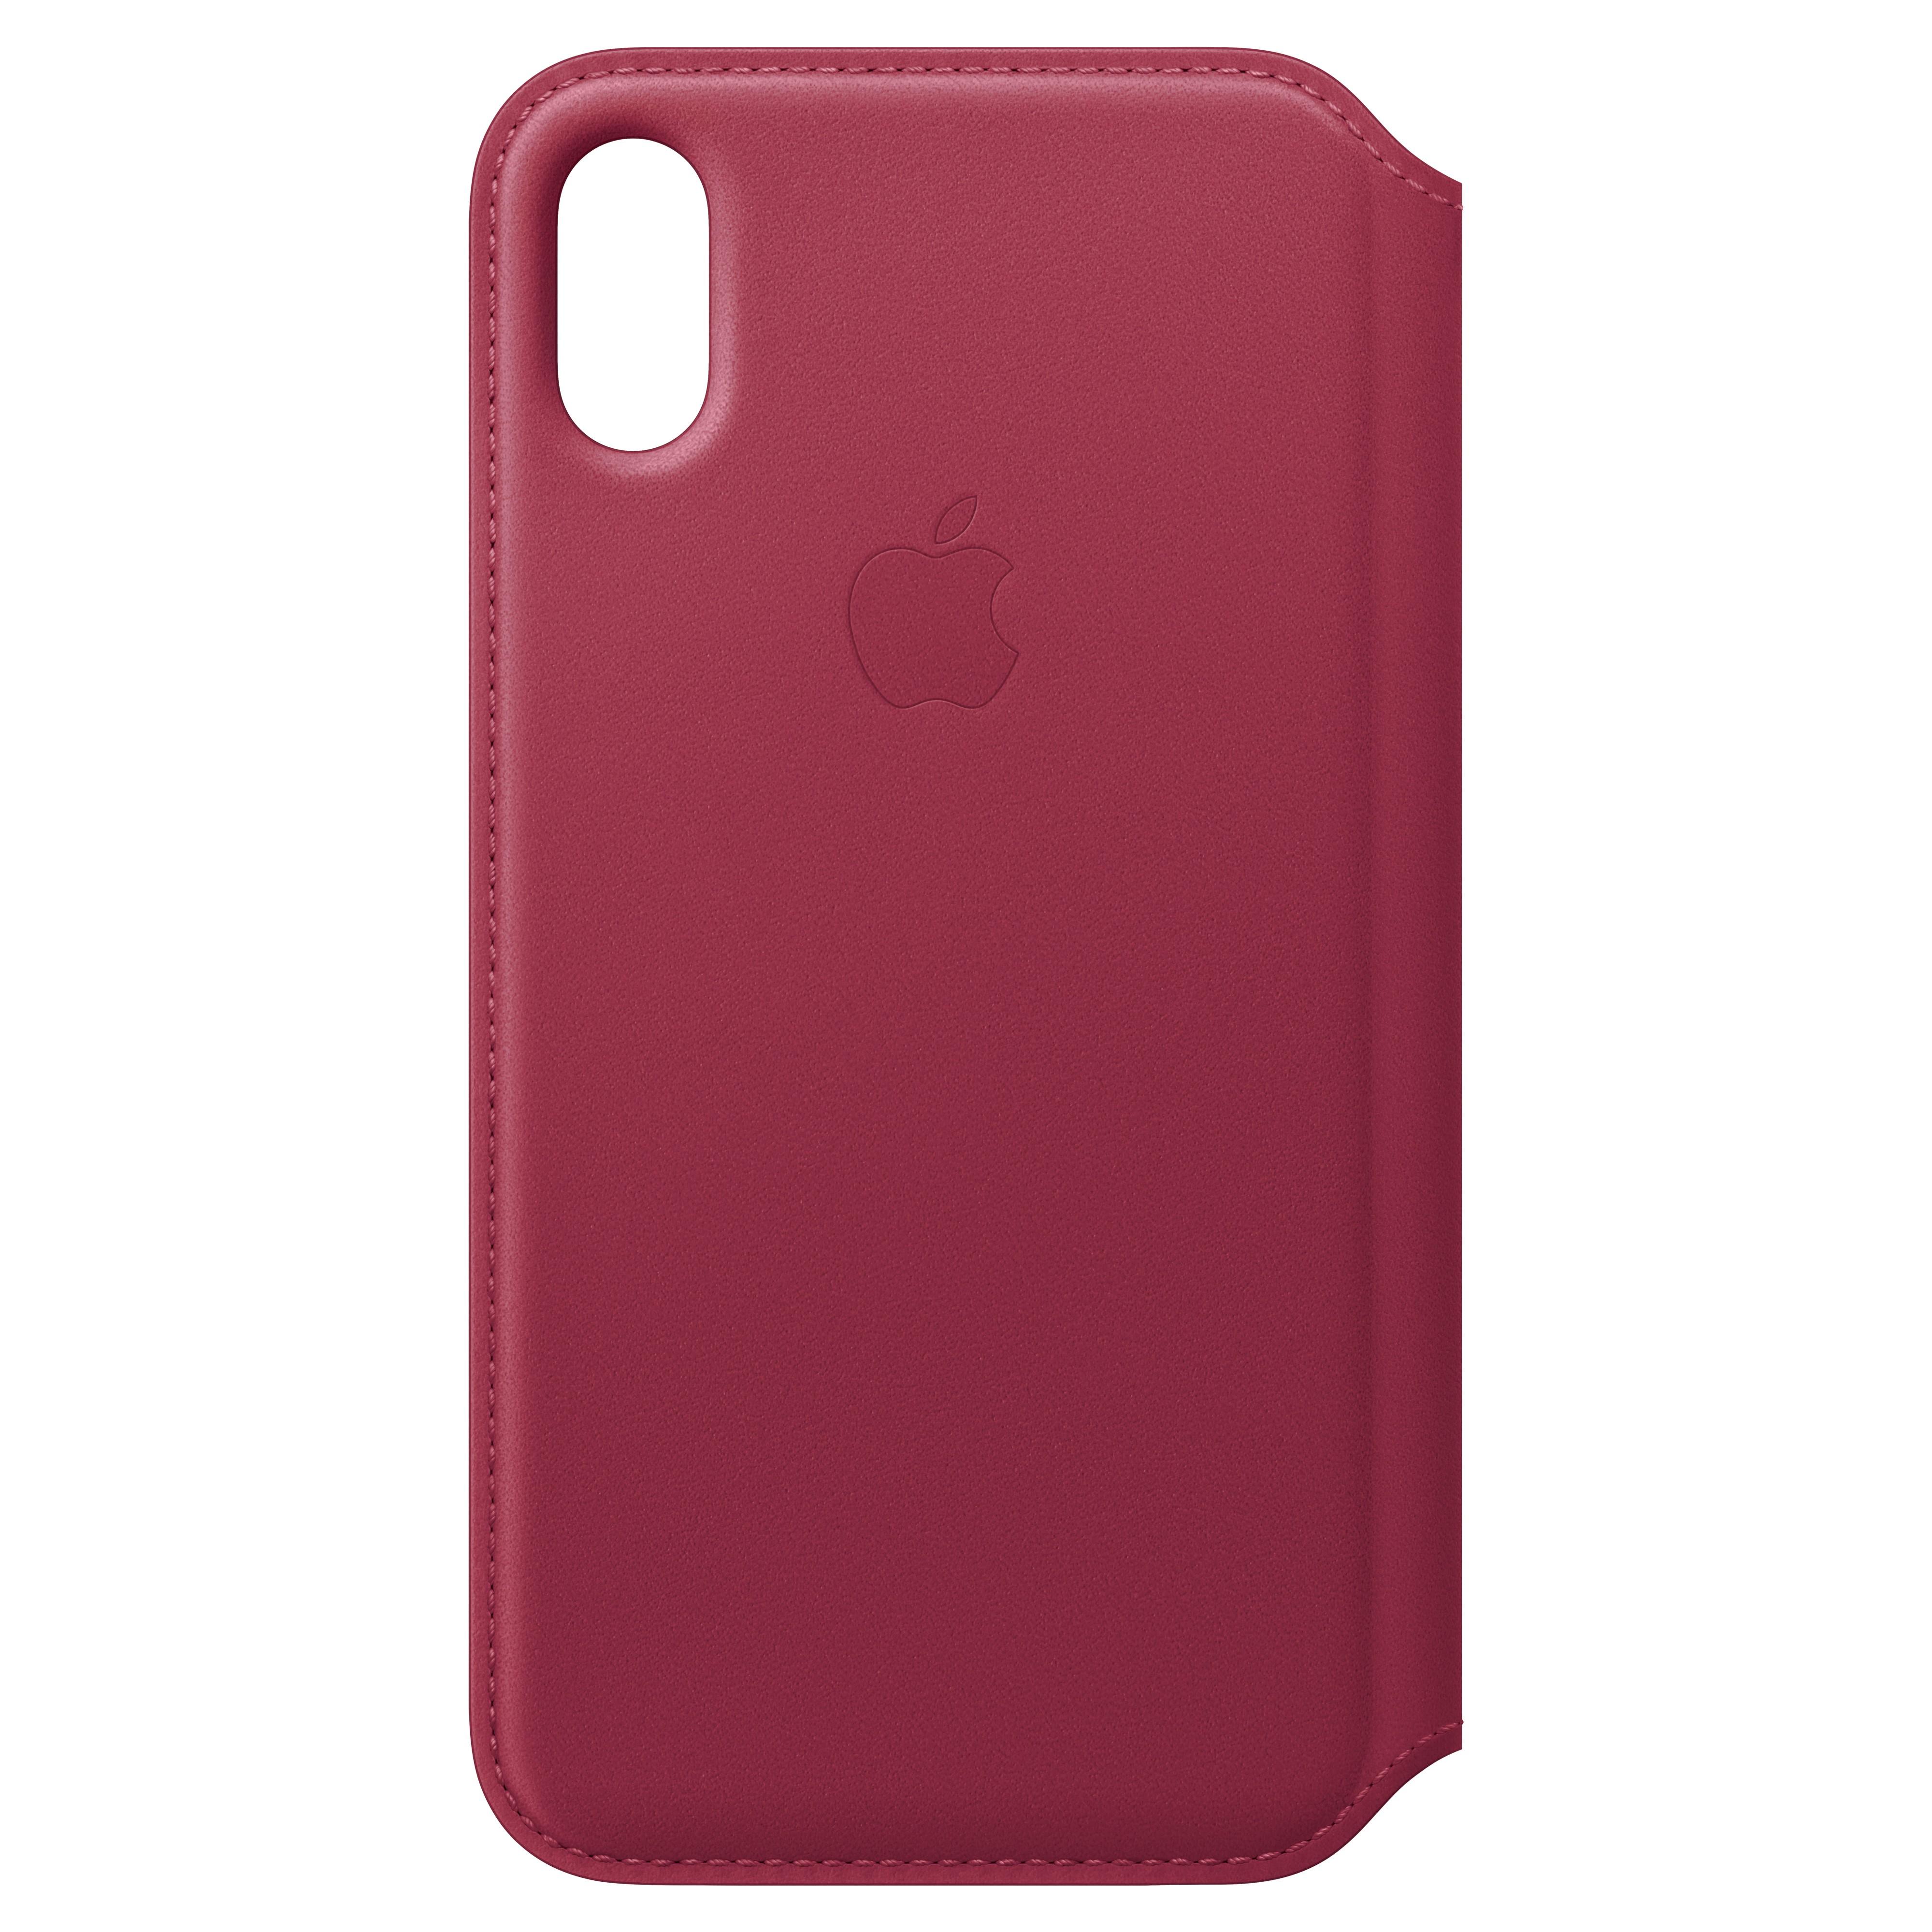 MQRX2ZM/A : iPhone X Folio skinndeksel (berry)